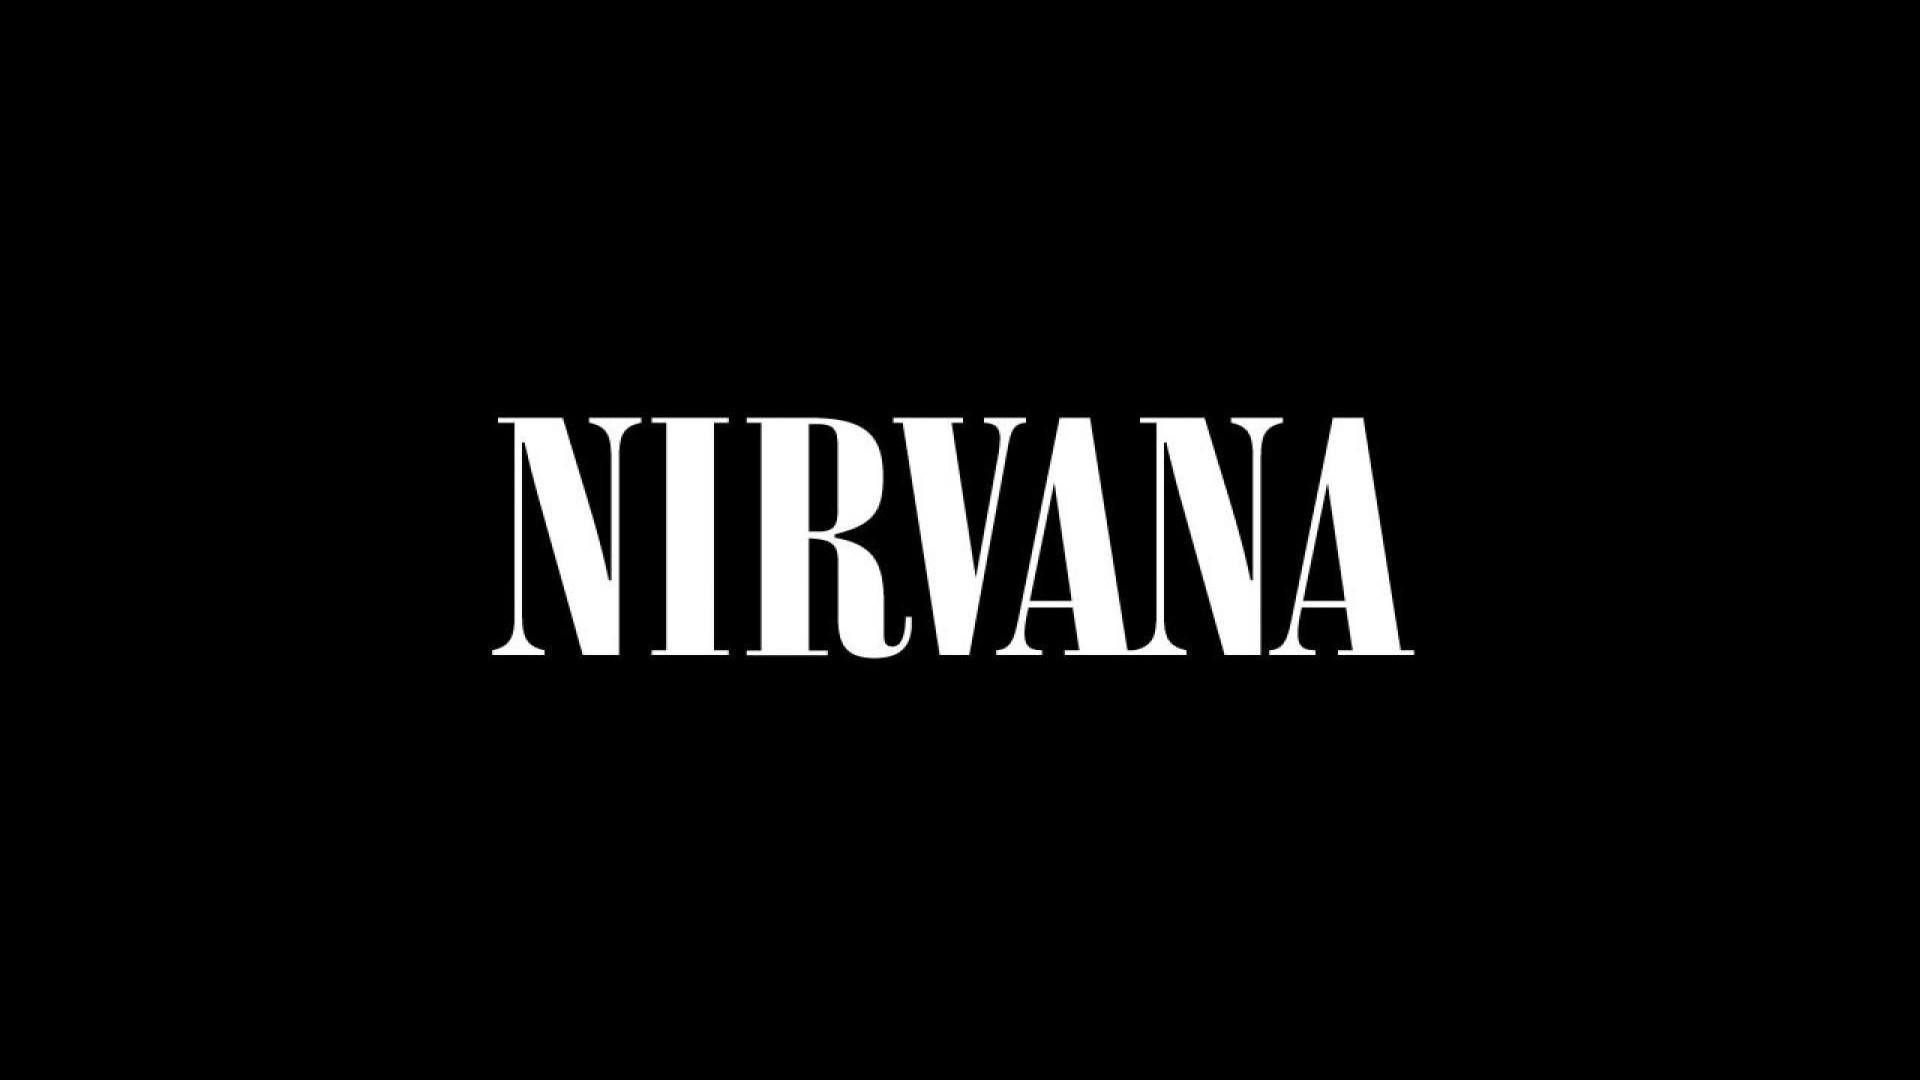 1920x1080 Nirvana Letters Logo Font Background